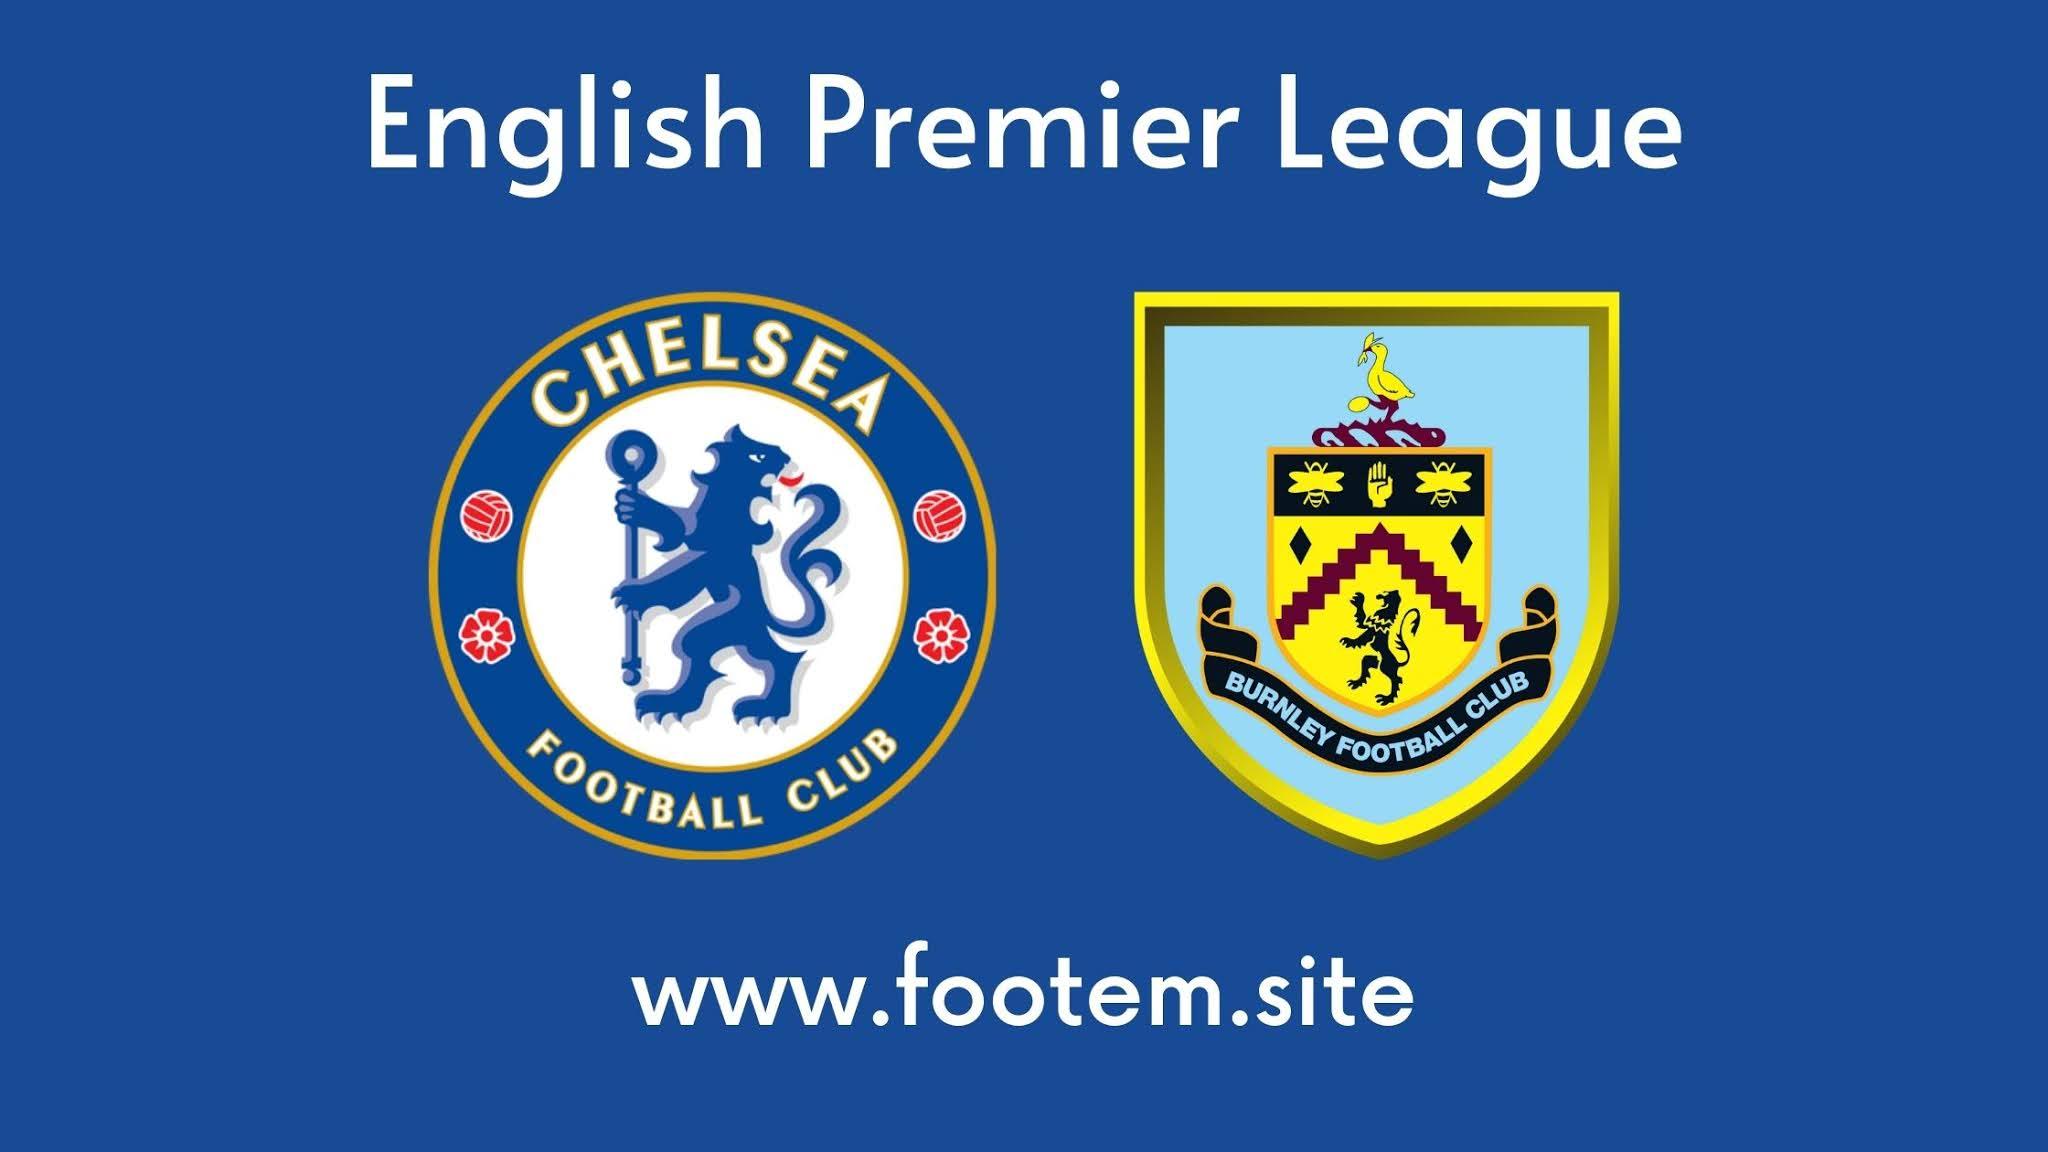 Chelsea vs Burnley footem site footem7